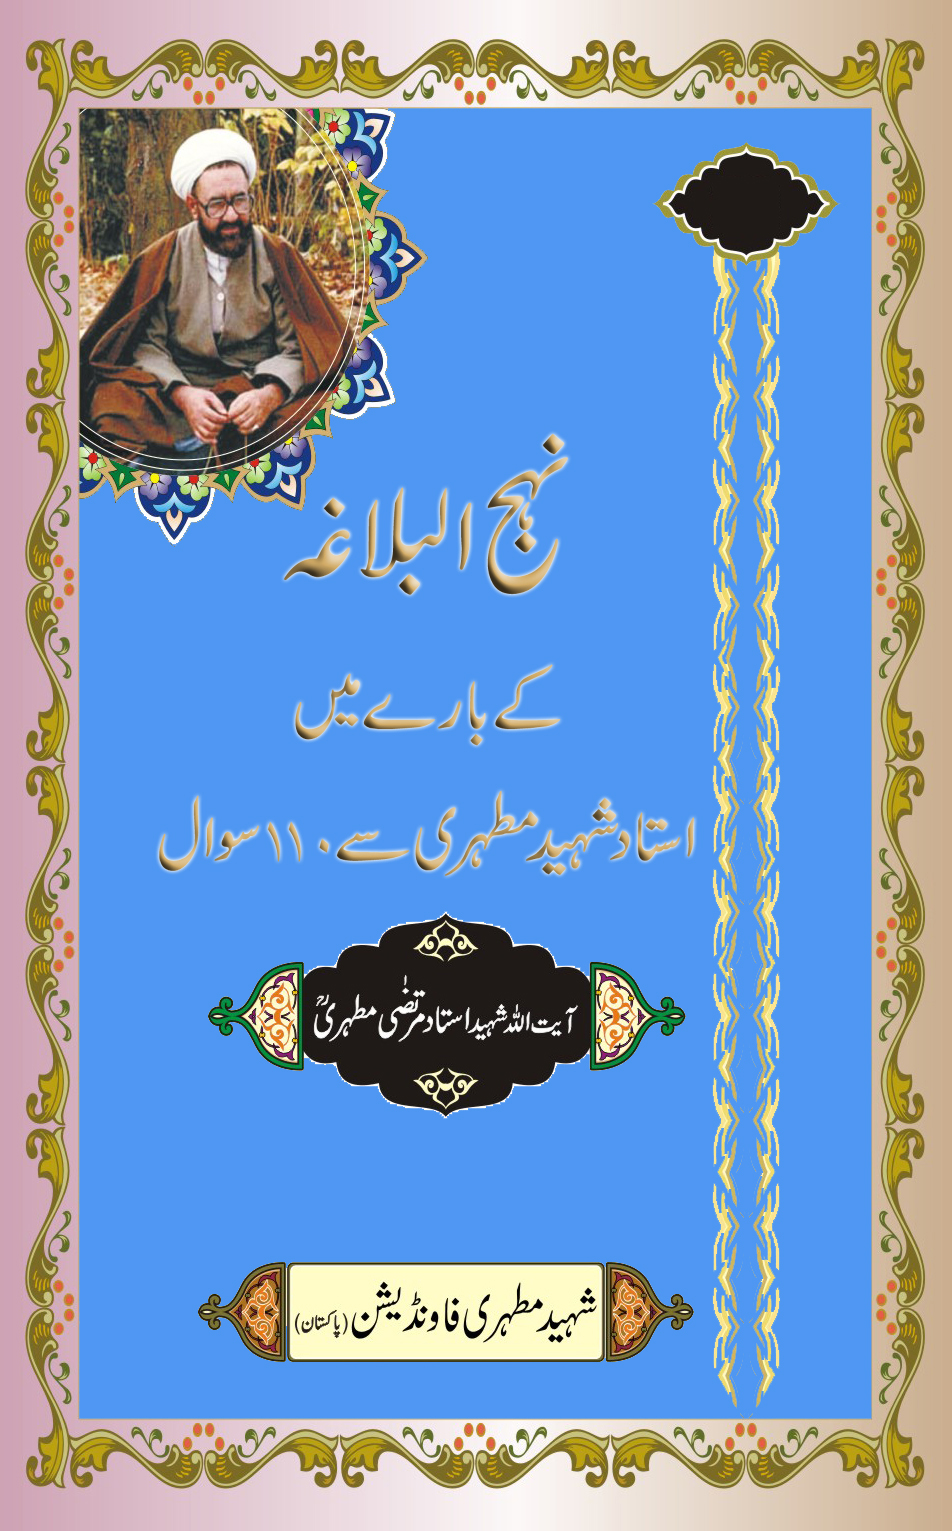 Asrar pdf urdu nahj ul in